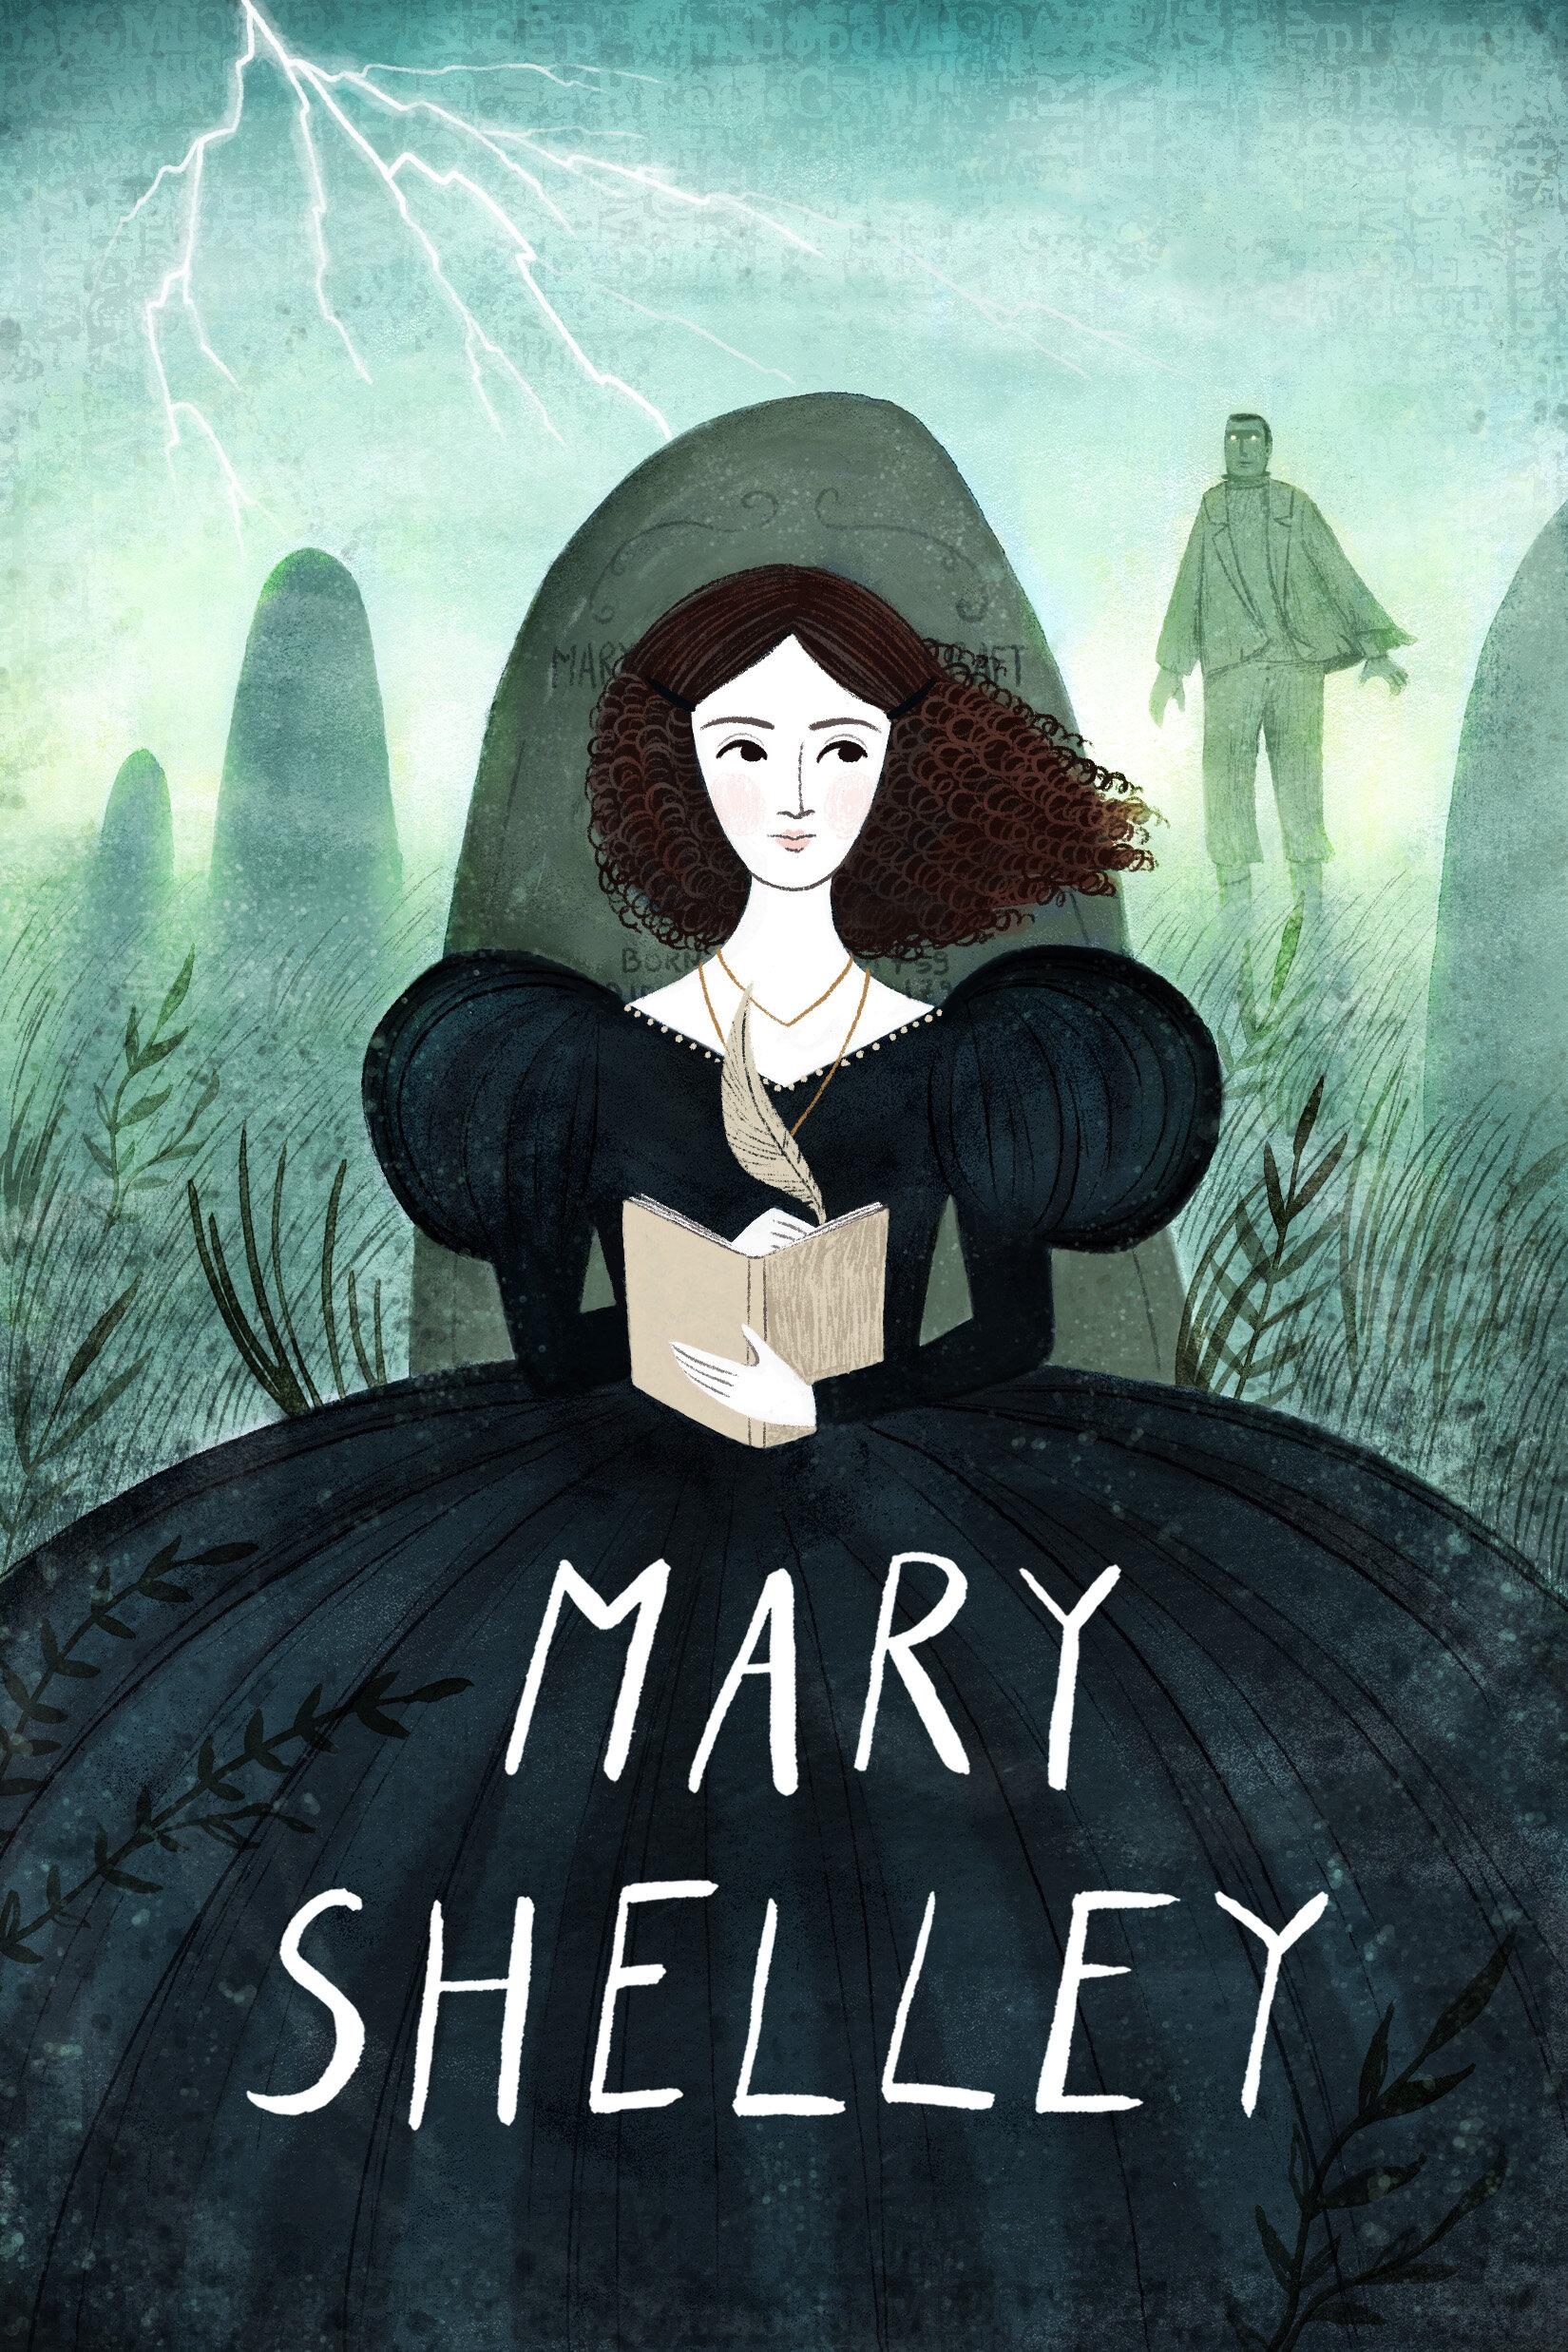 Mary Shelley_cover illustration.jpg